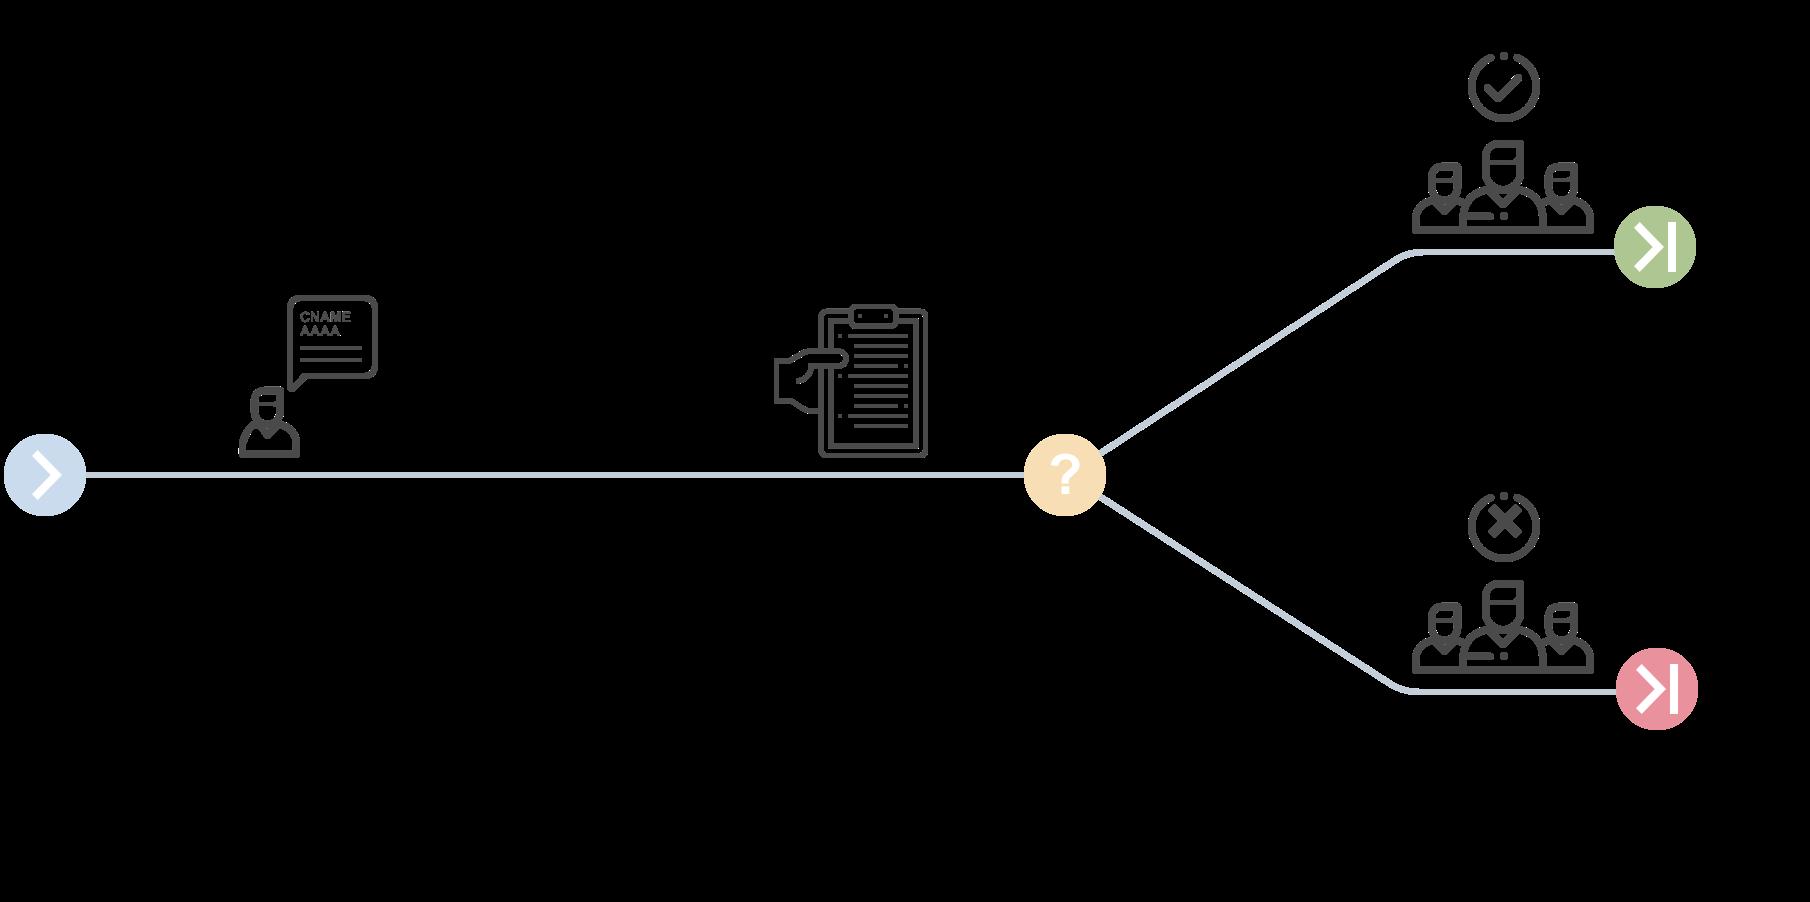 ../../../_images/workflow-diagram.png